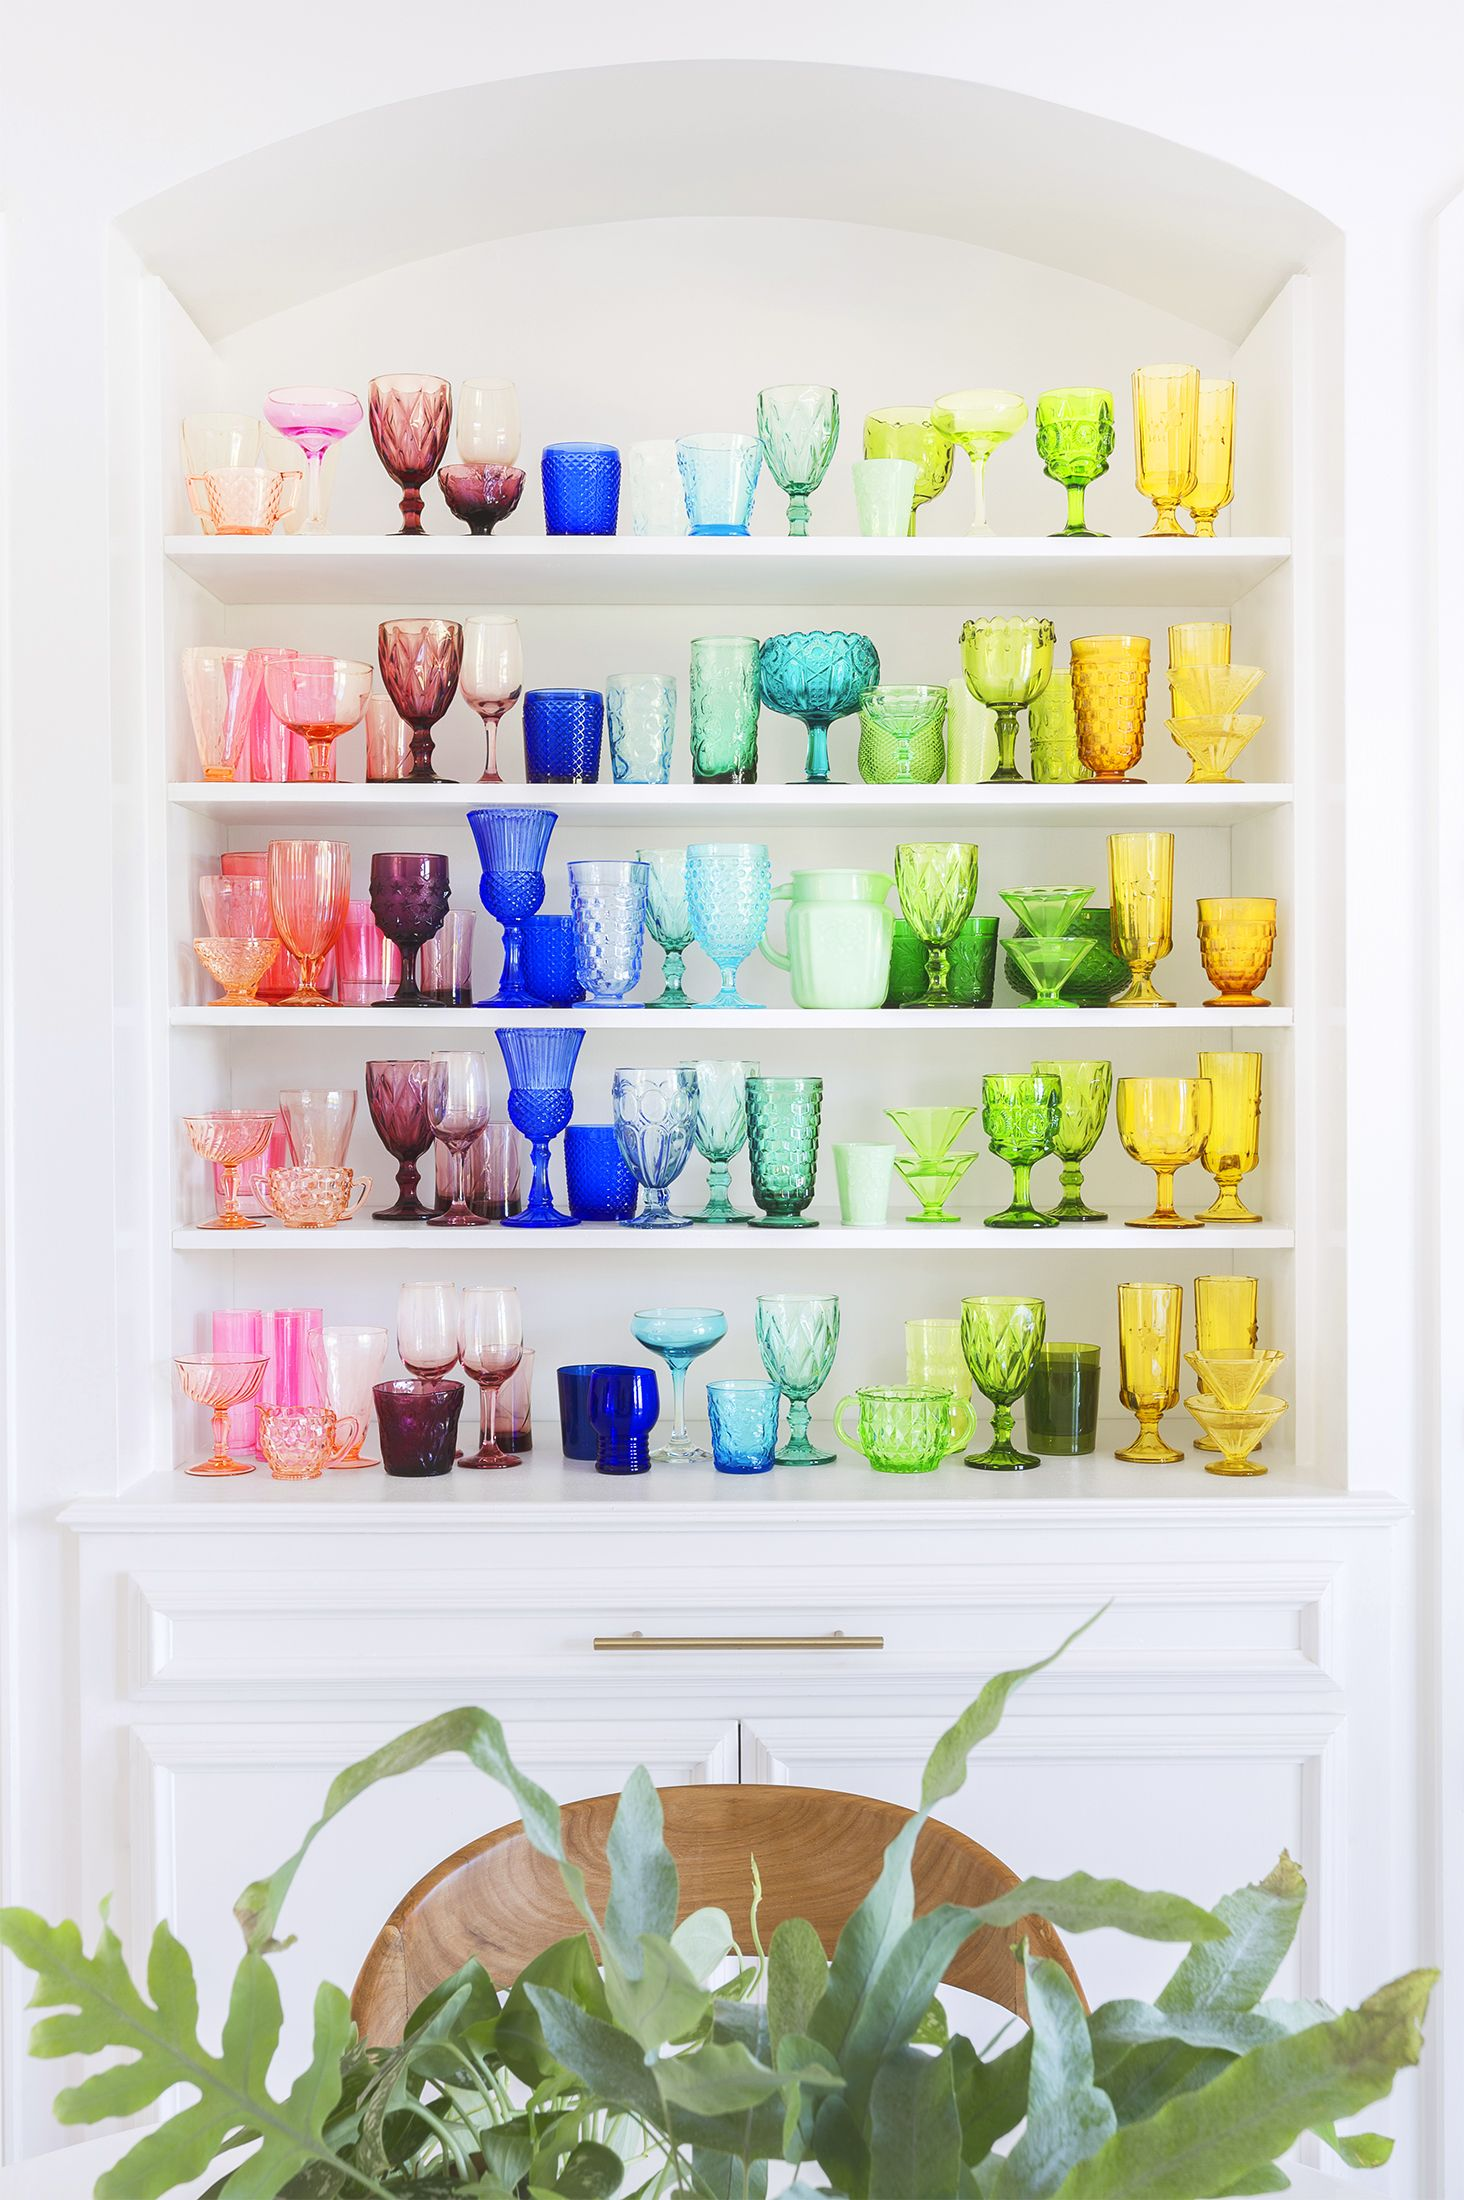 Spring Decor Ideas - Colored Glass